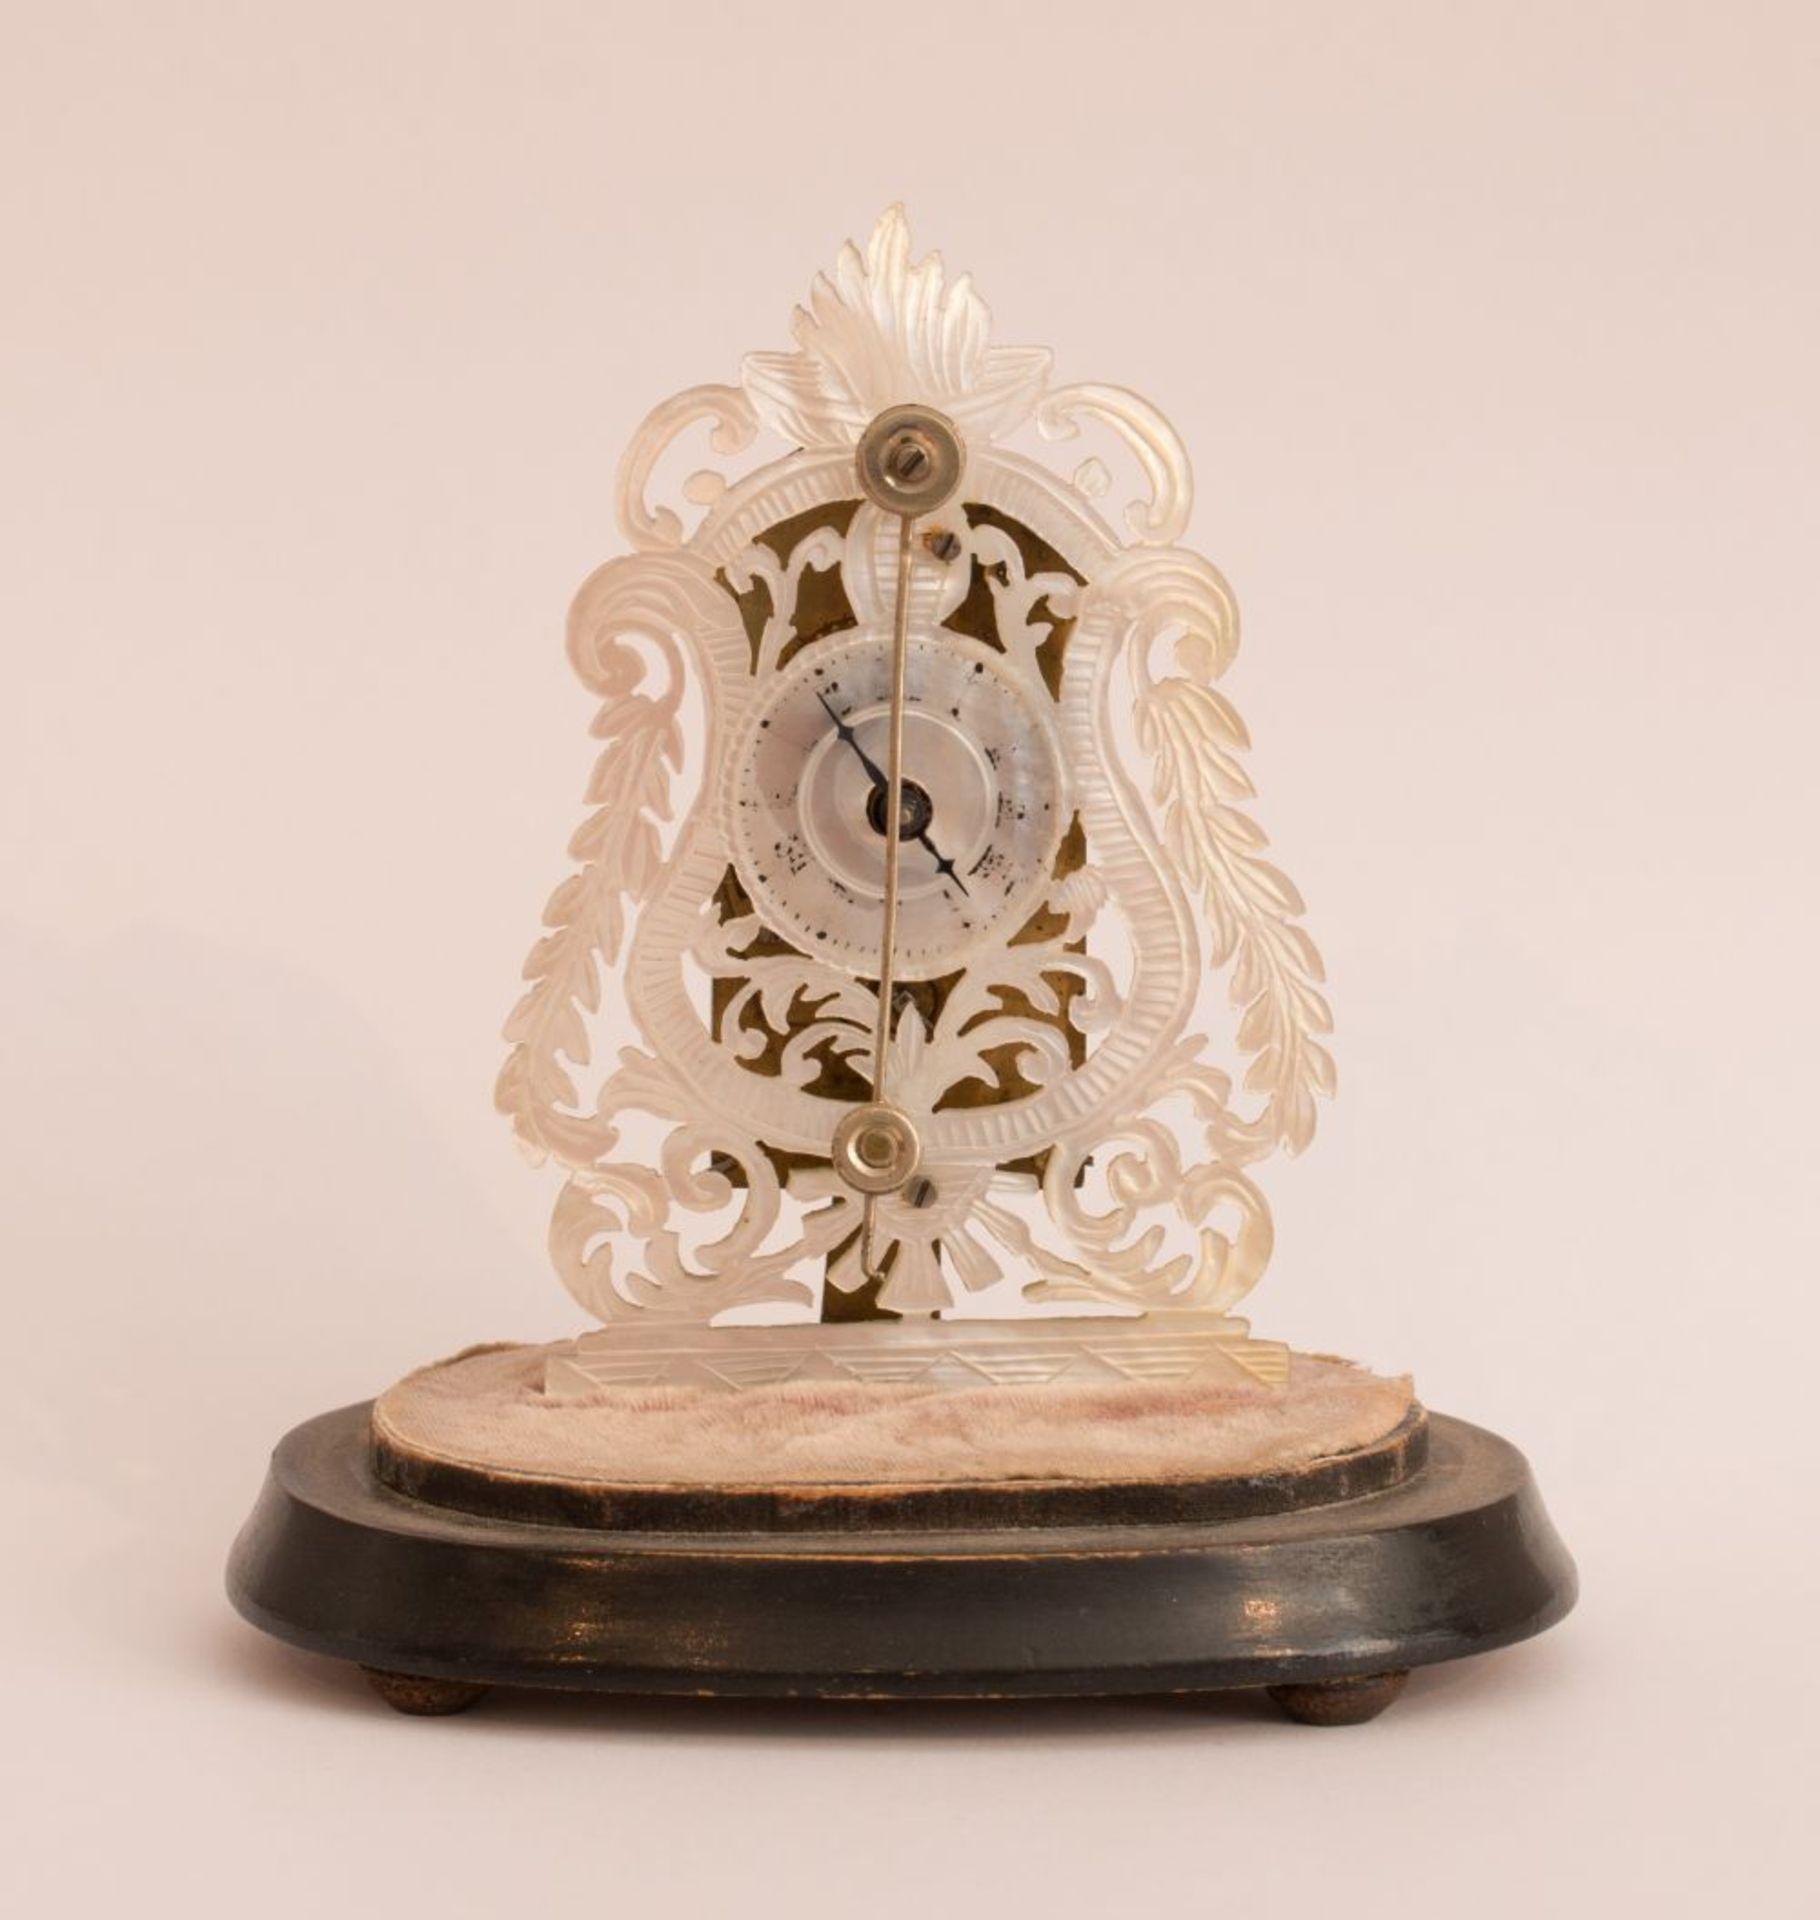 Los 67 - Zappler Mother of PearlFidget Clockaround 1830 H 8 cm x W 8.5 x 3 cm Glass lintel 12 cm Mother of